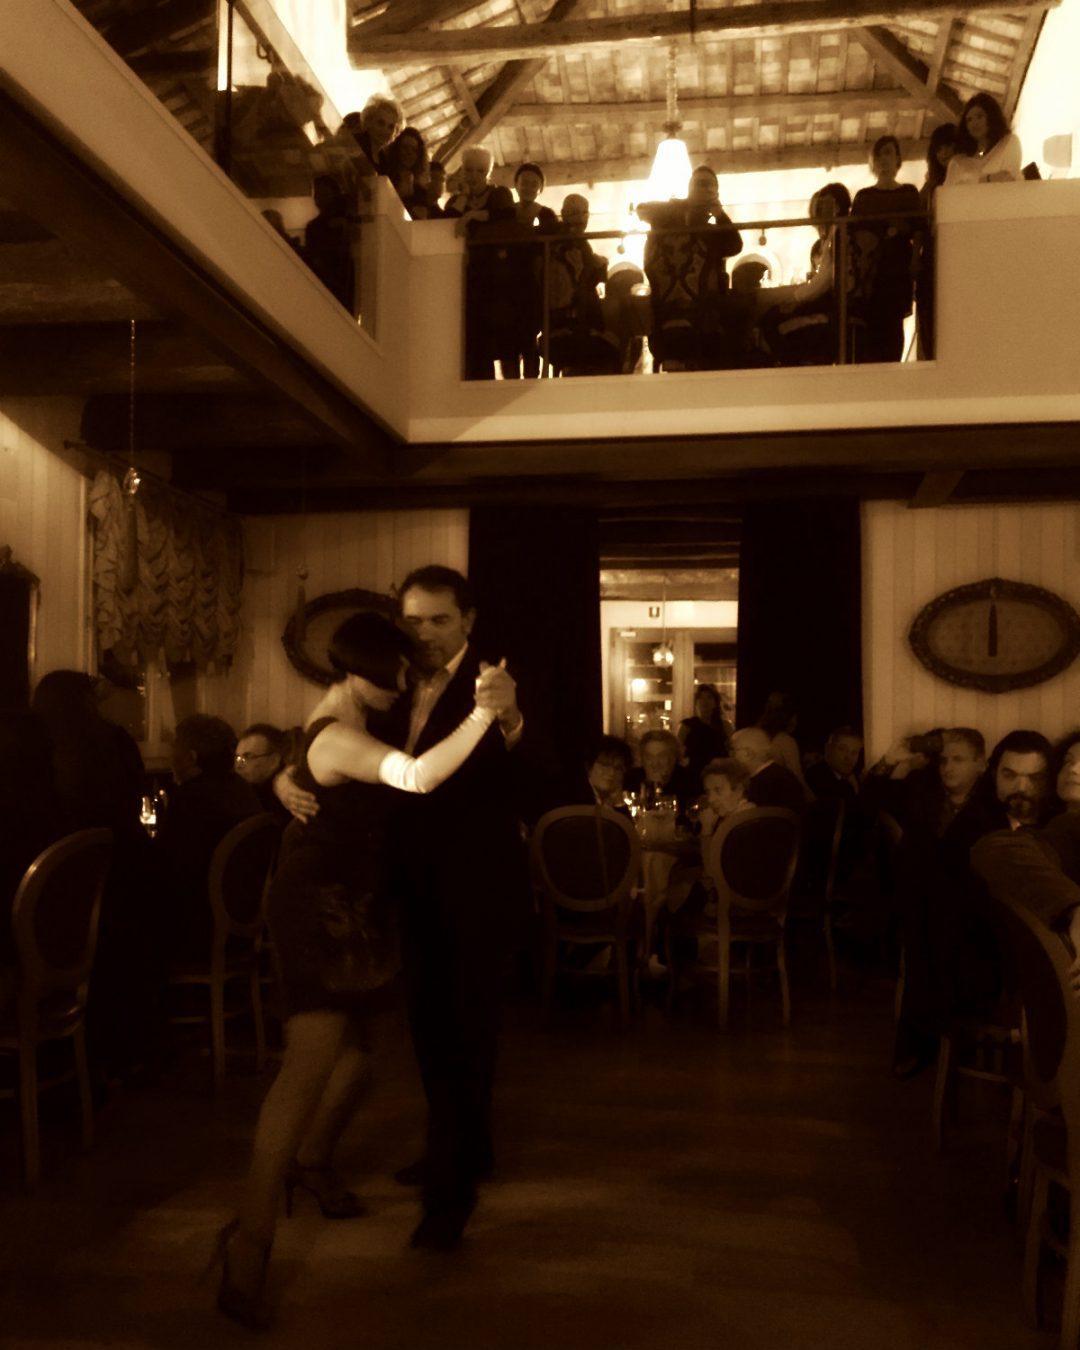 Tango argentino ravenna